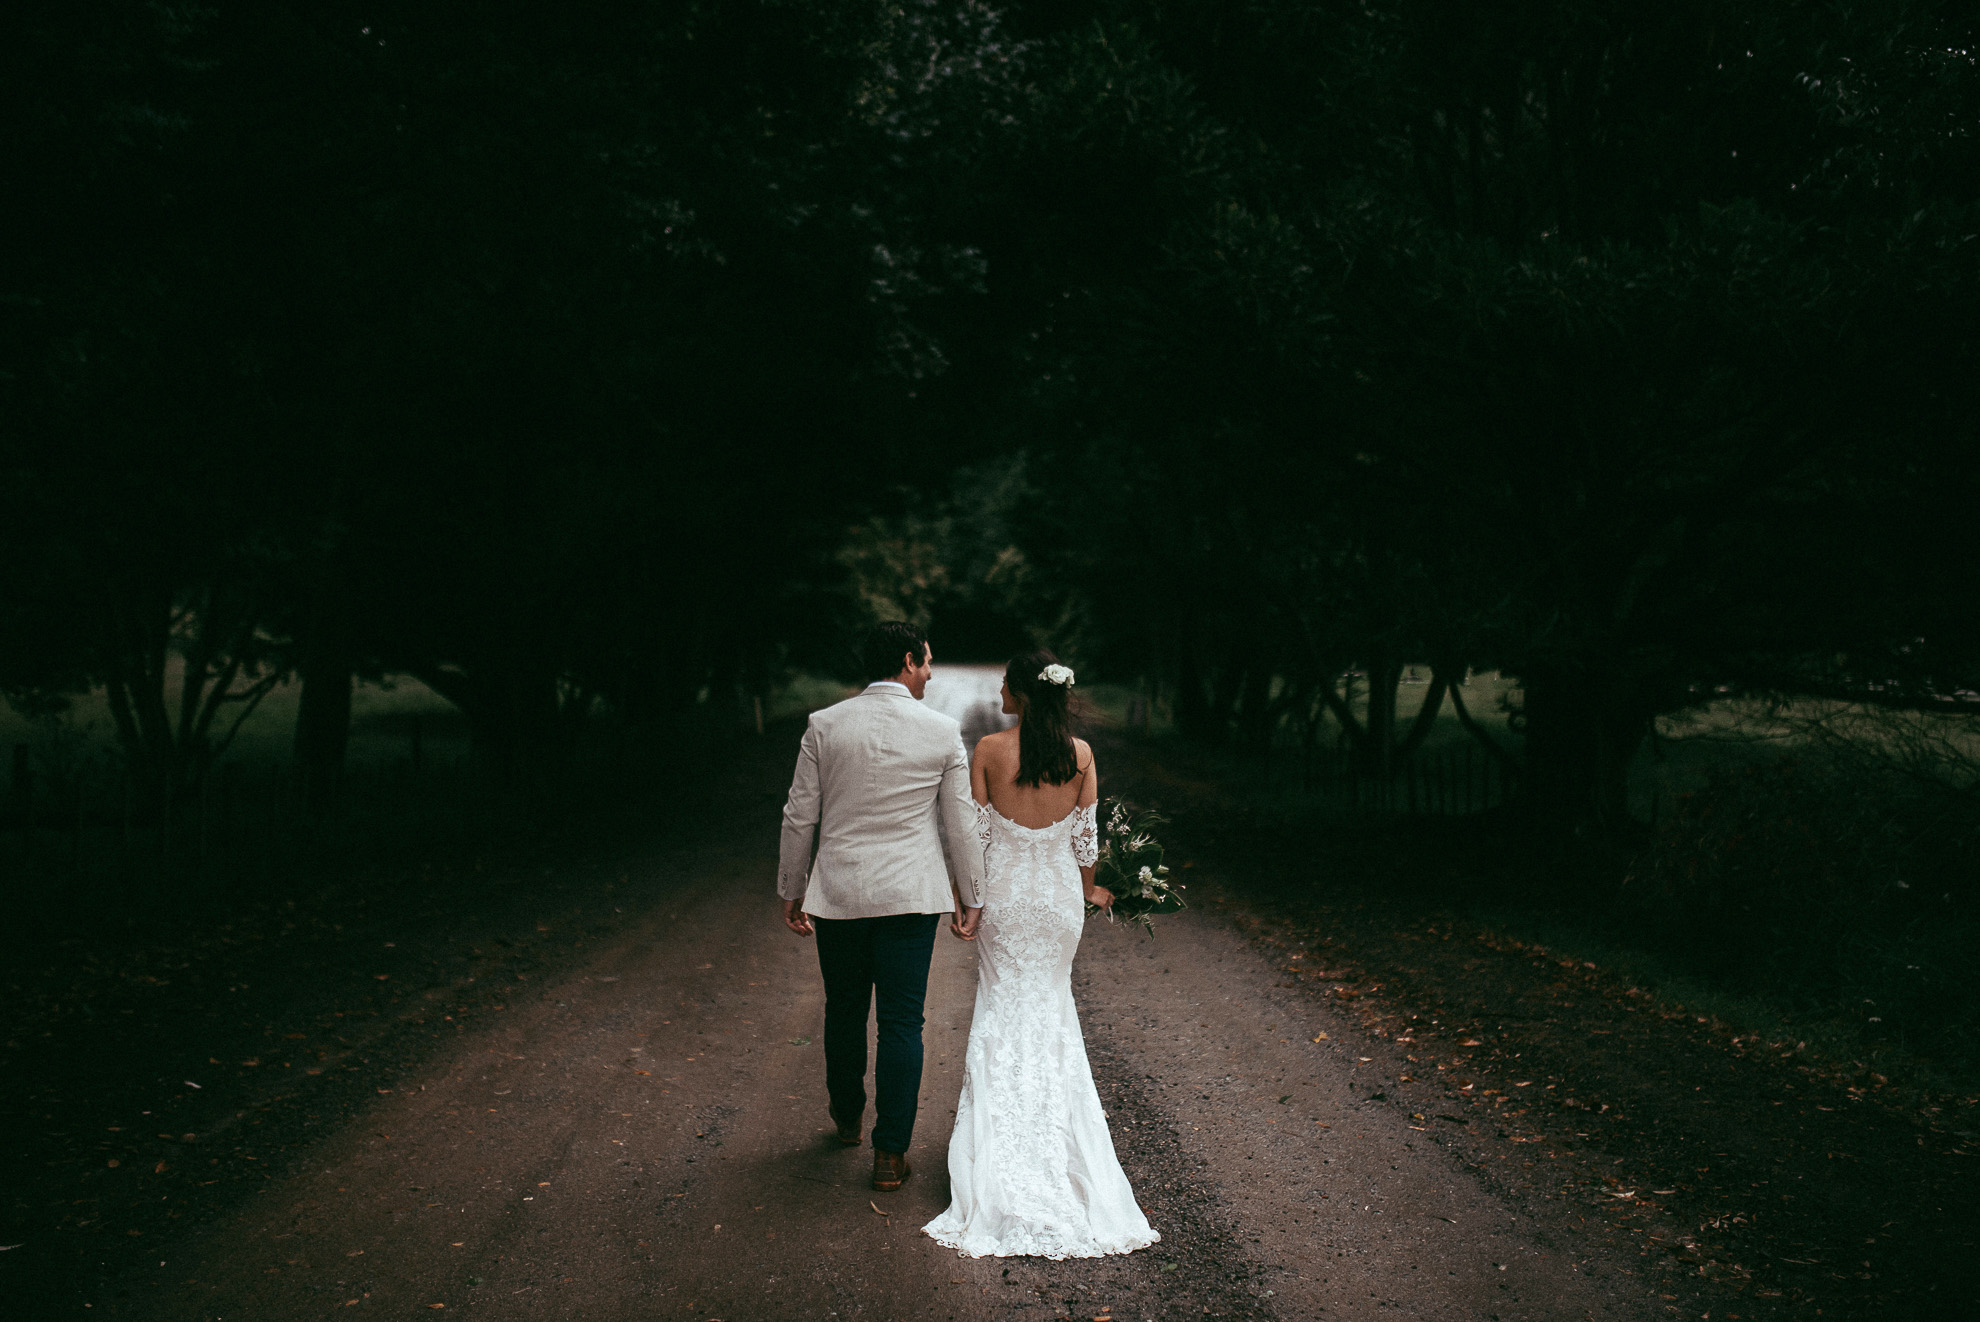 wedding-by-levien-641.JPG